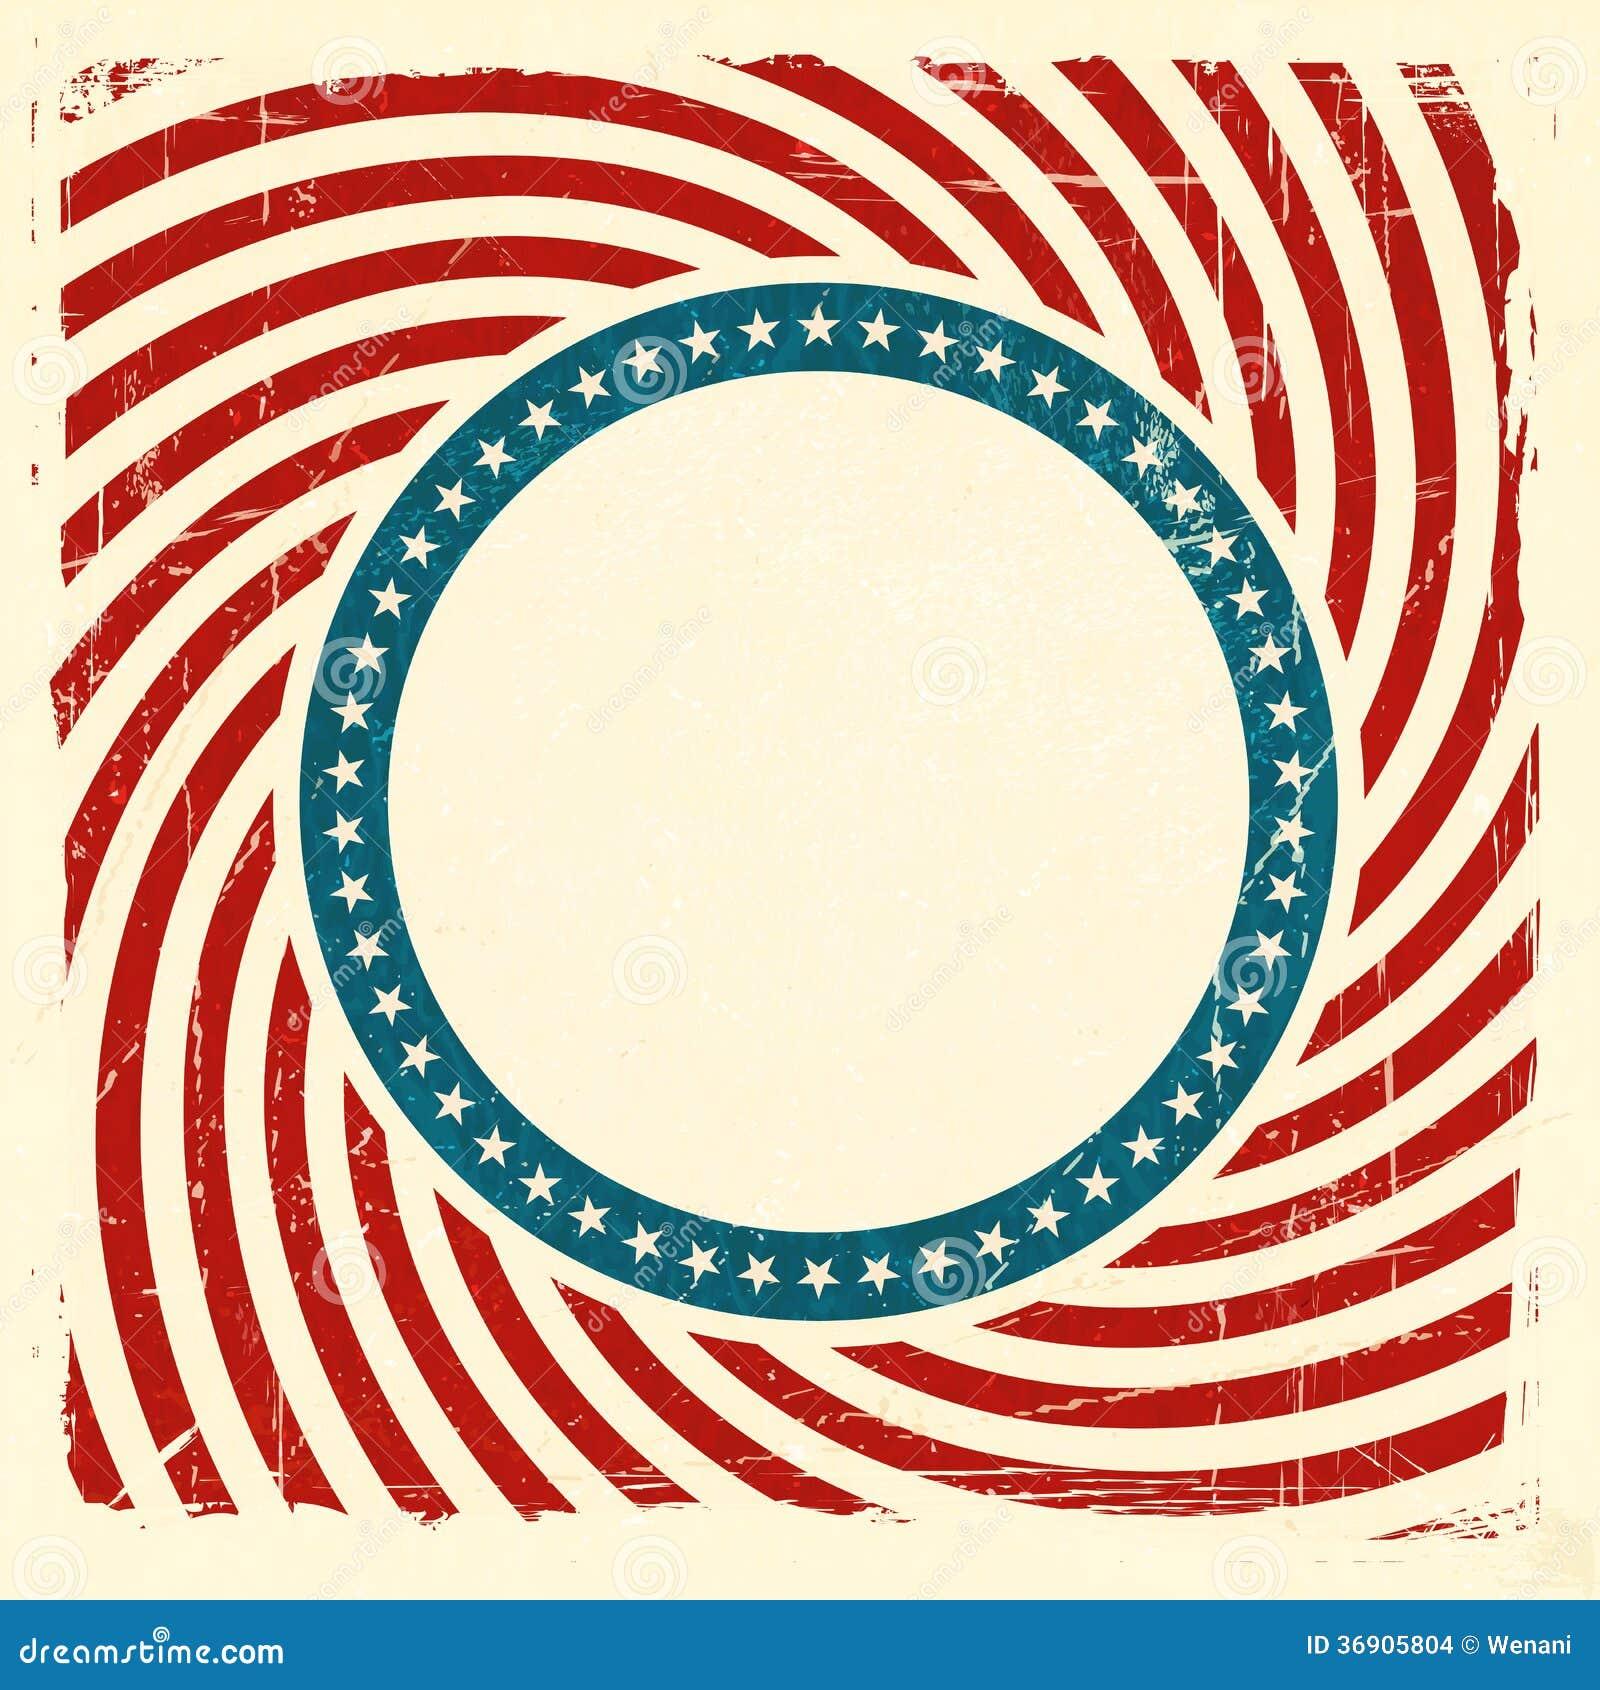 Swirly Stripes And Stars USA Grunge Background Stock ...